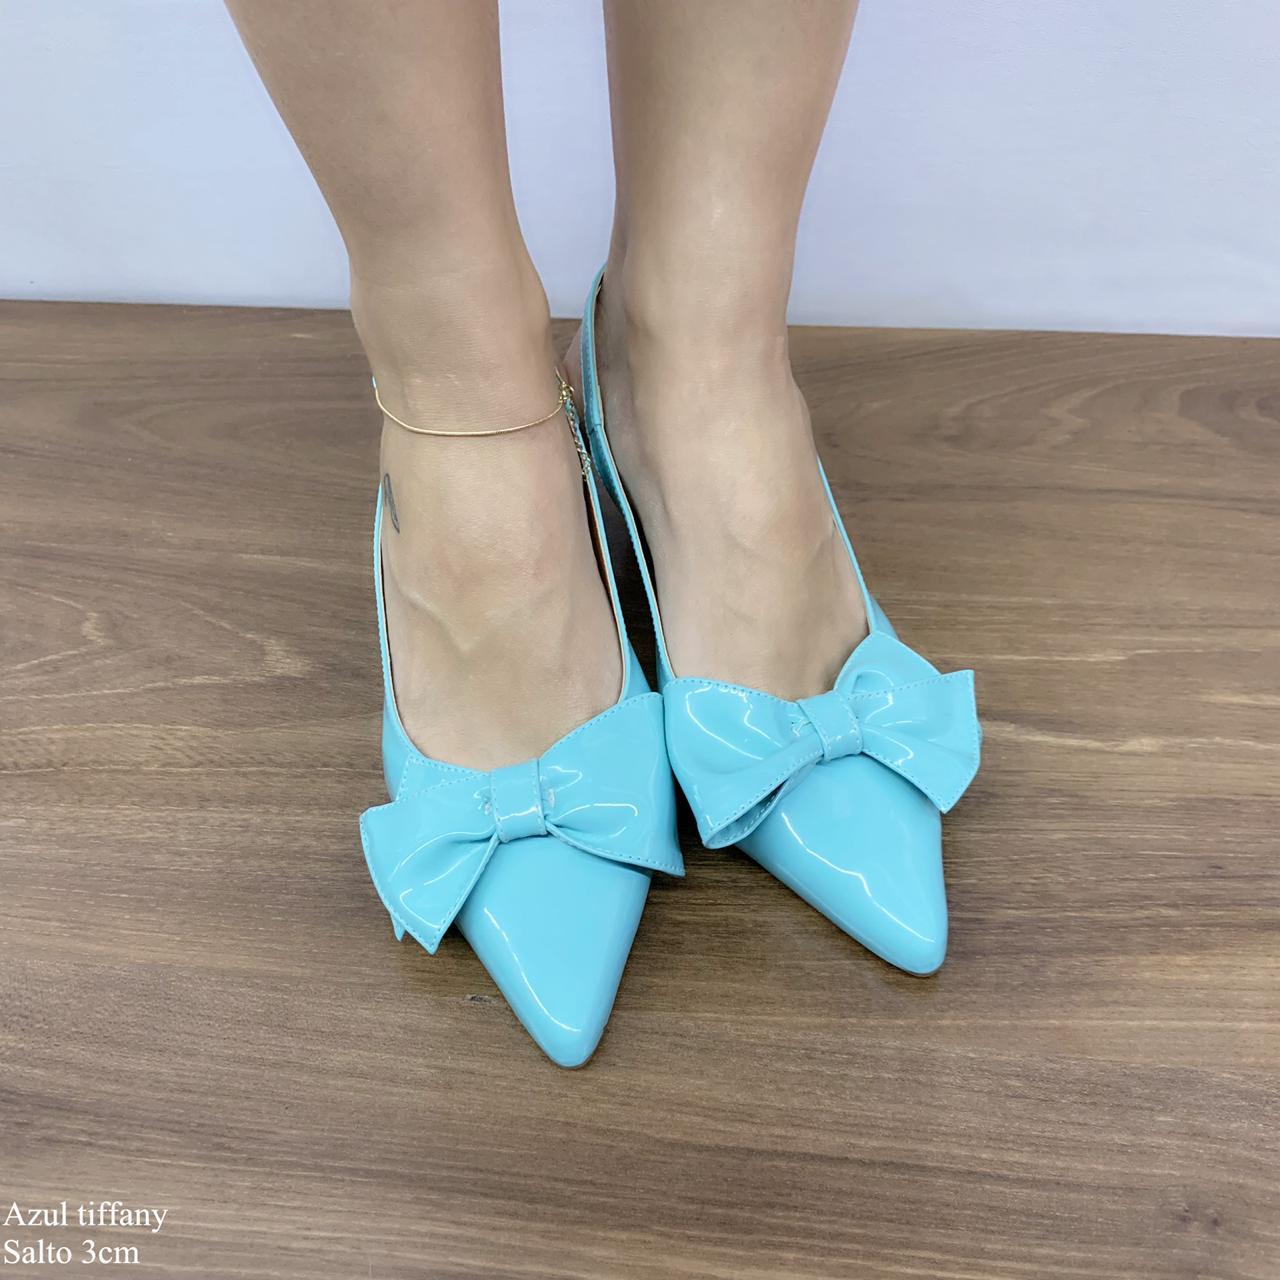 Scarpin Chanel Azul Tiffany